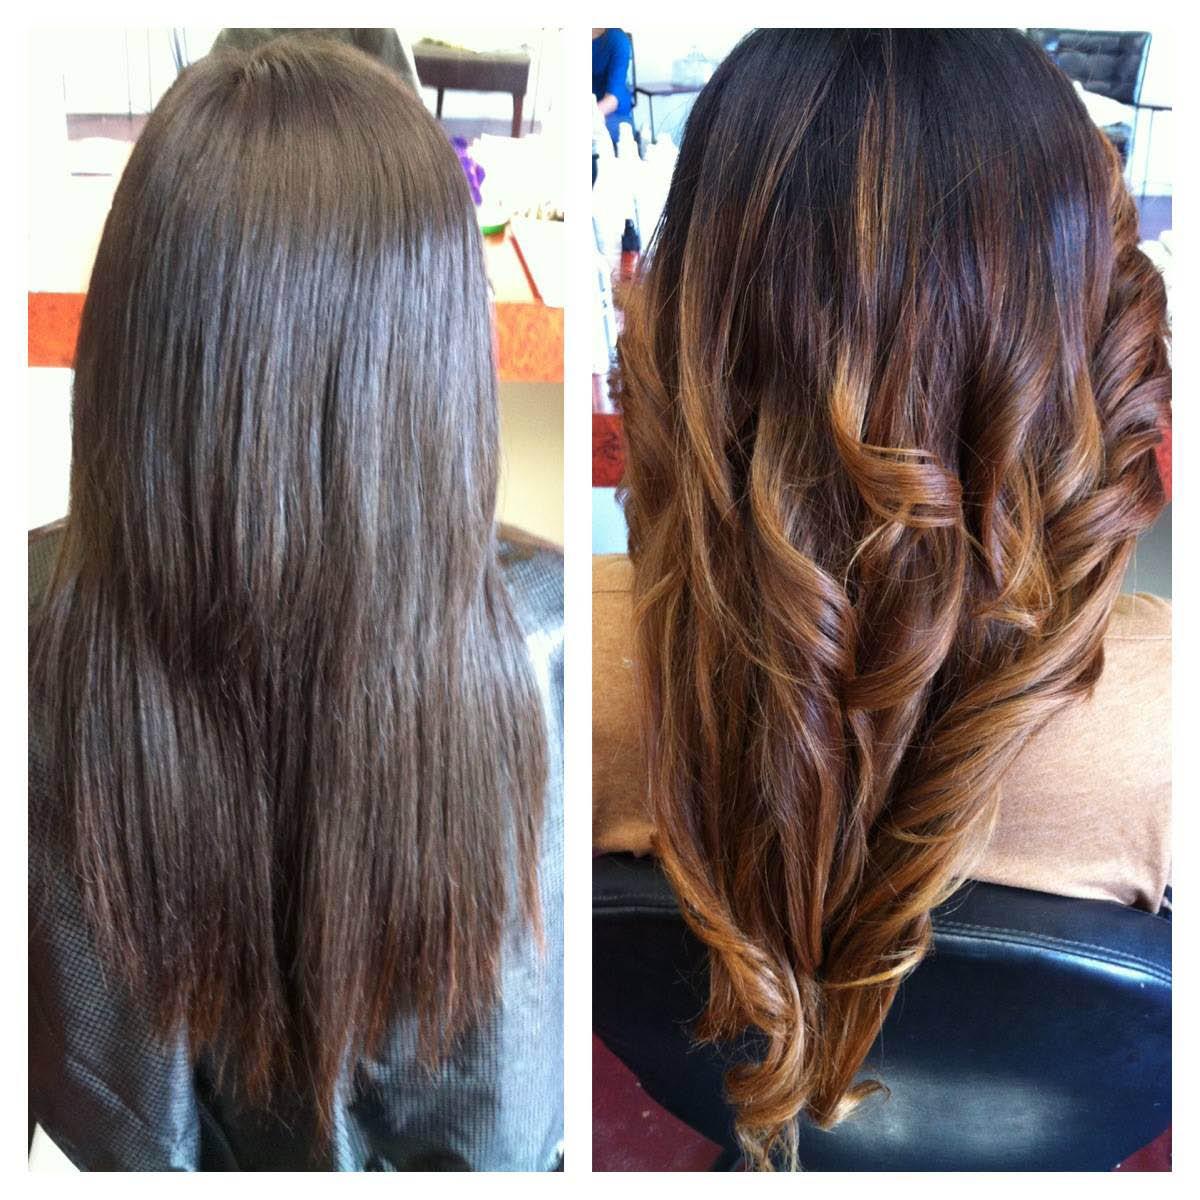 Total hair revitalization coupons in Westlake Village, CA